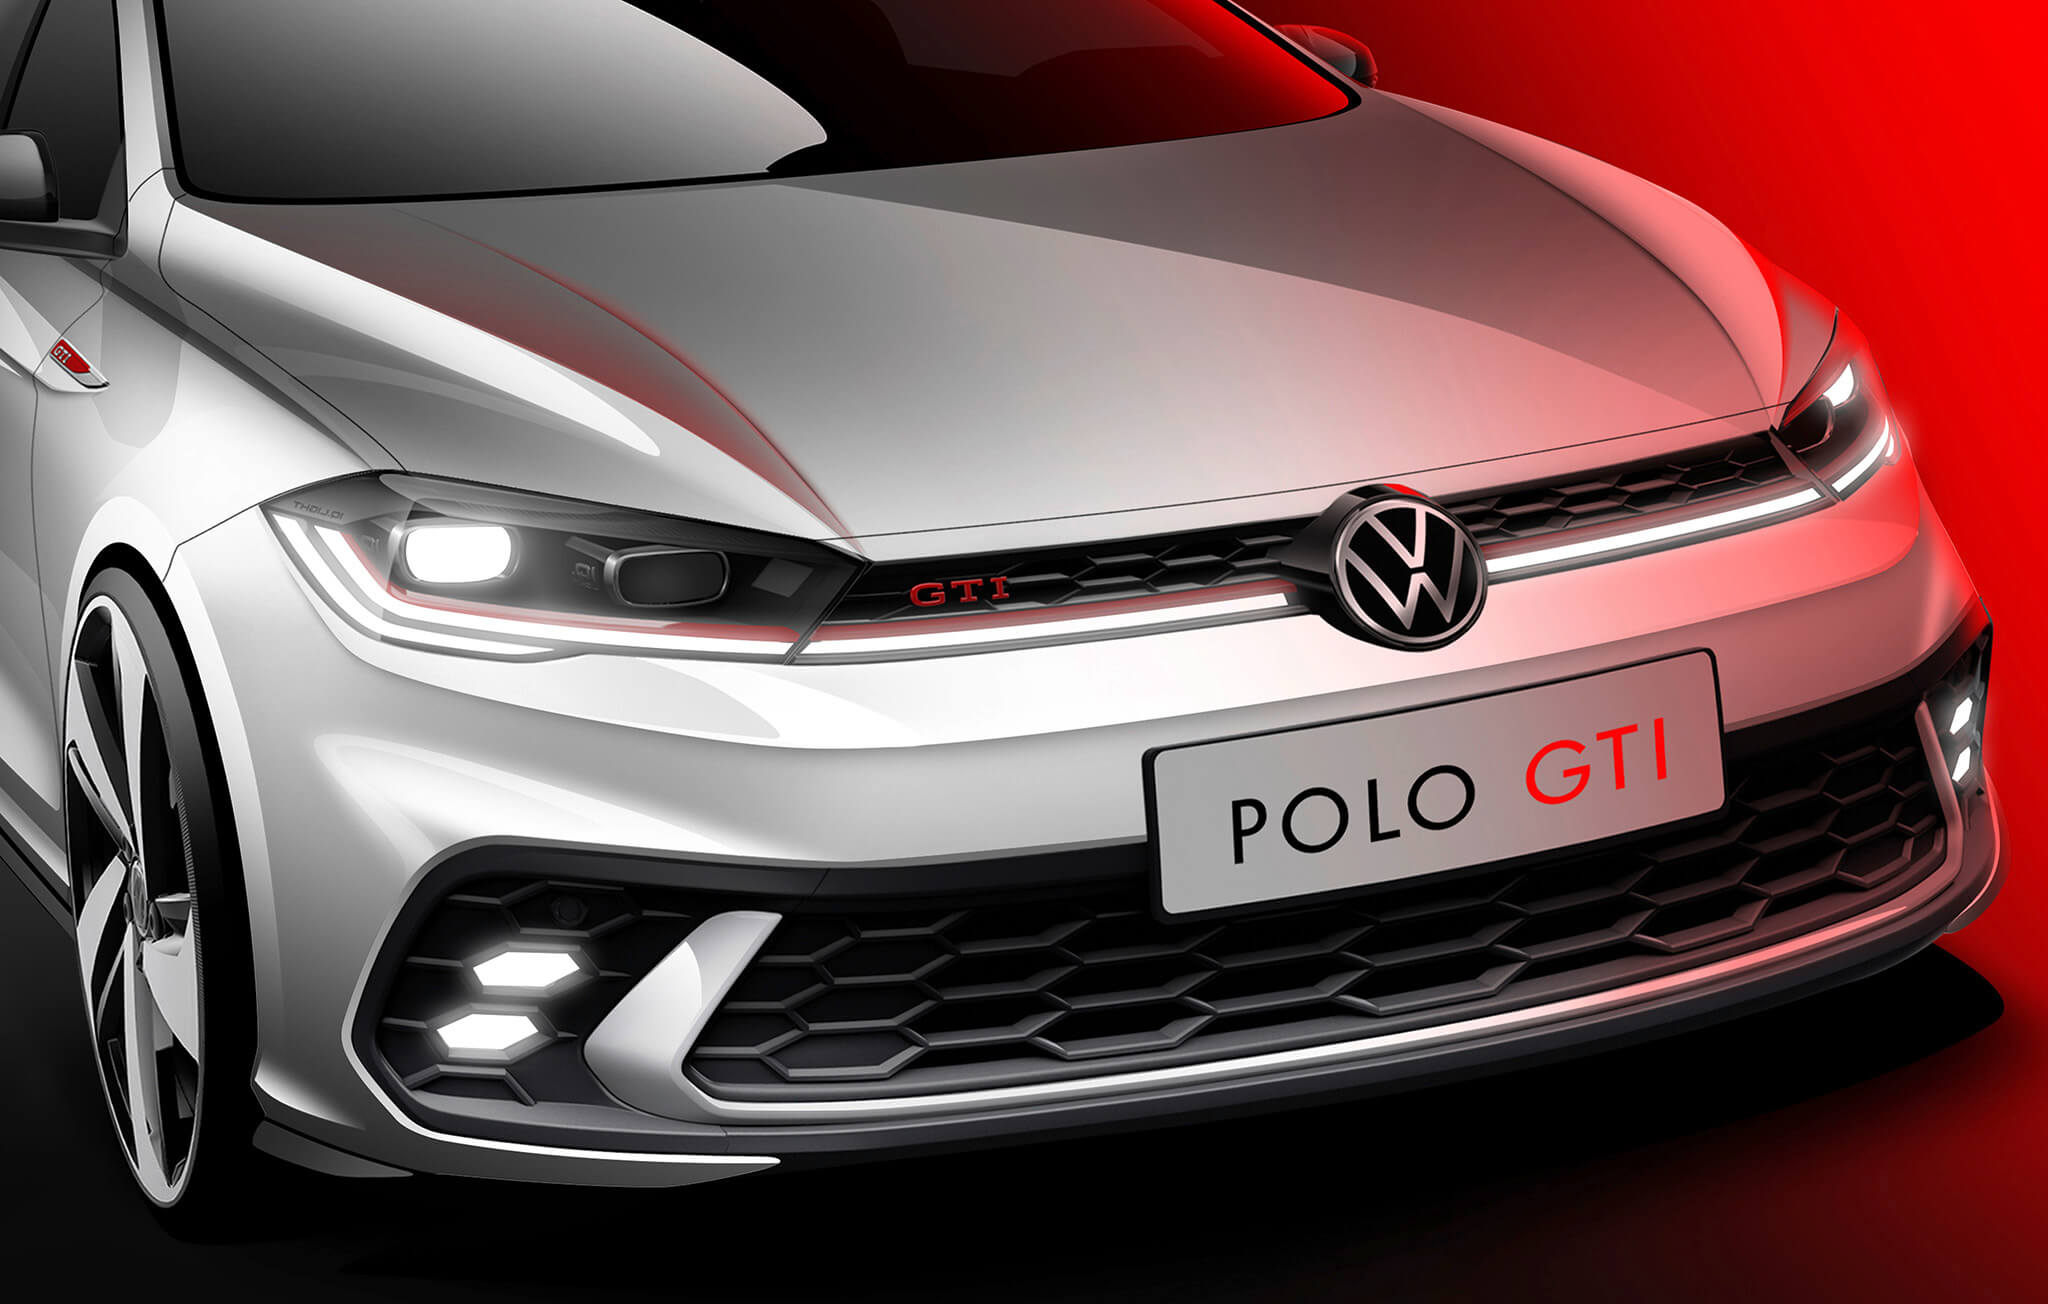 Volkswagen Polo GTI teaser